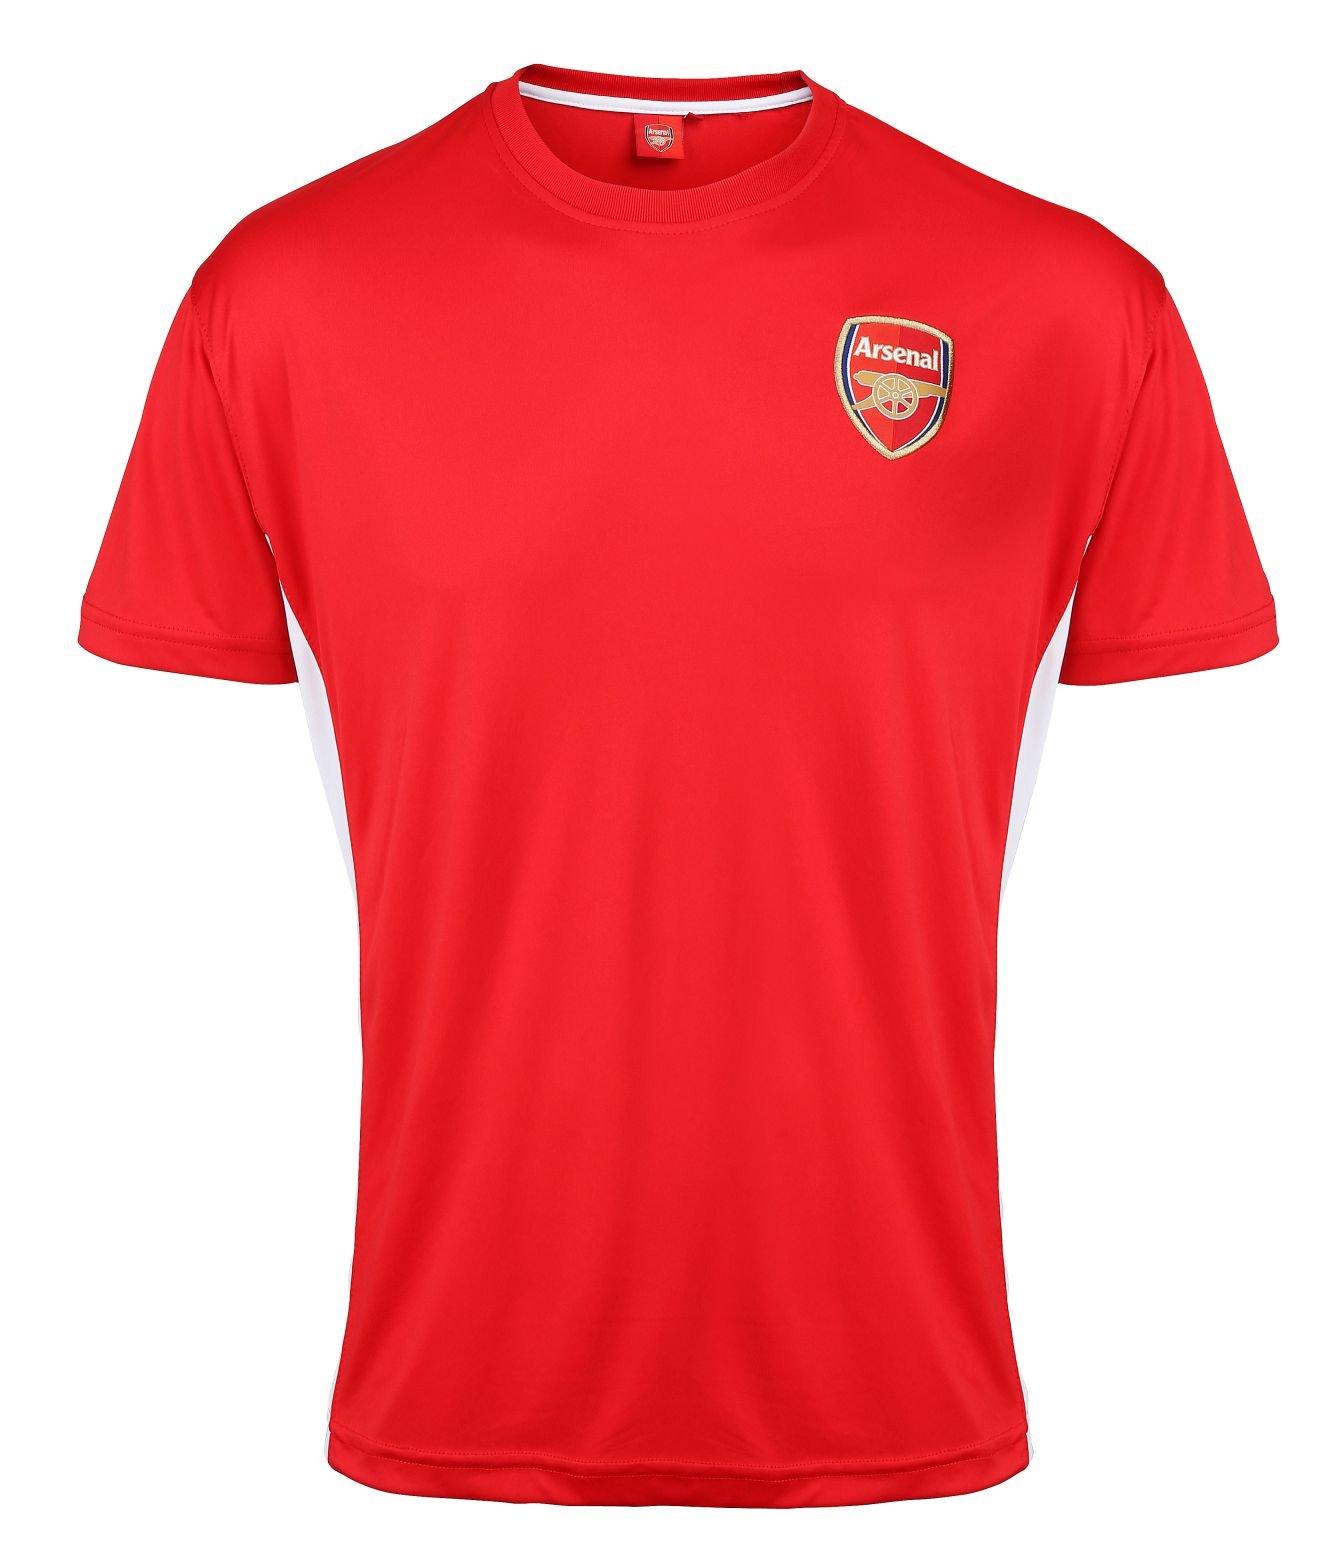 official football merchandise s arsenal t shirt of300